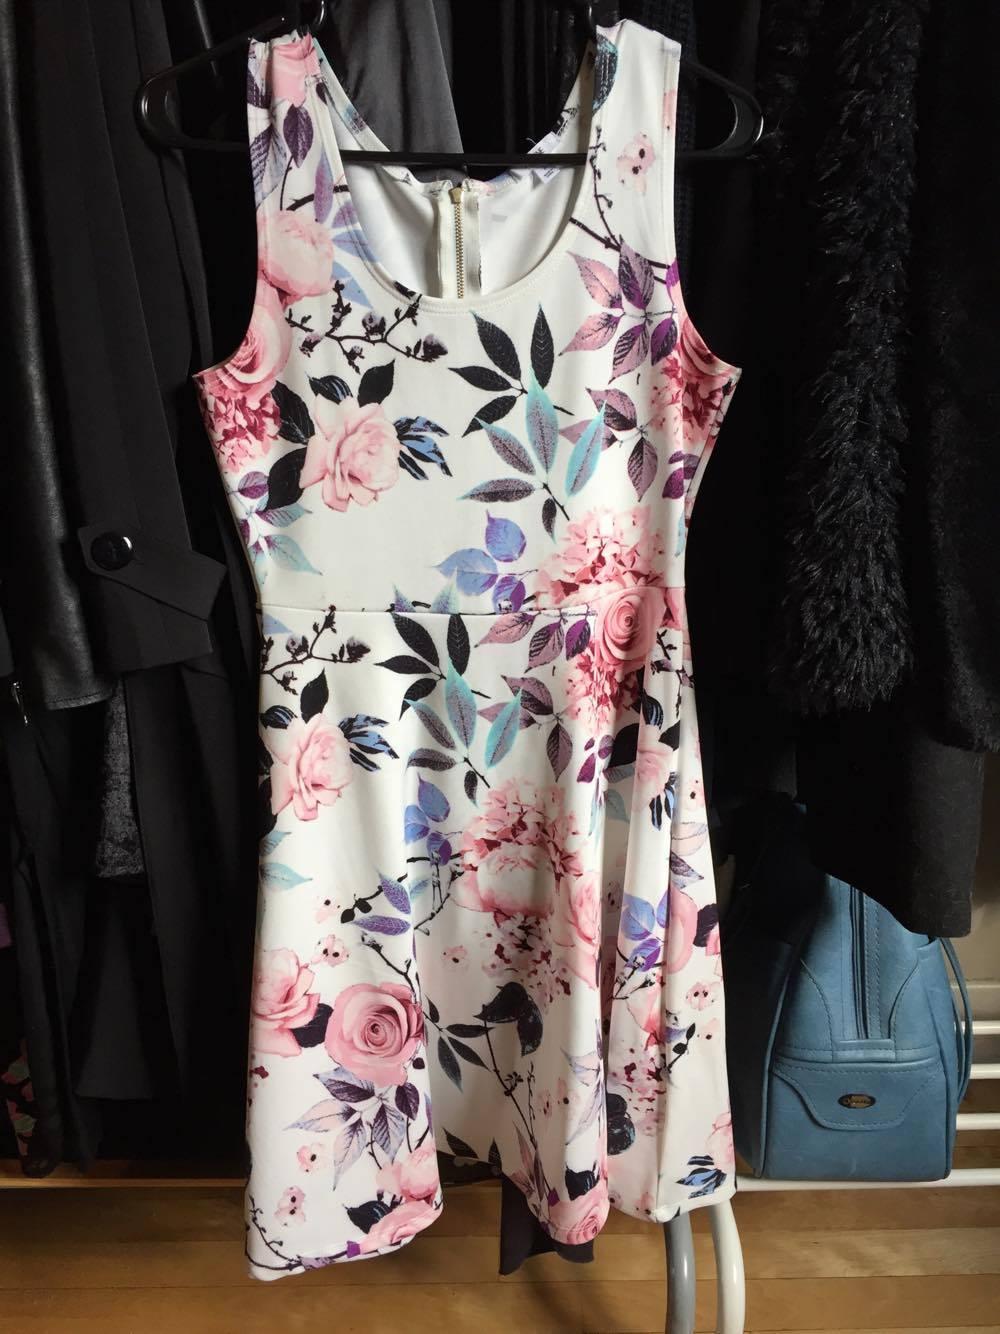 robe dress outfit fashion linge vetements mode ootd look fleurs